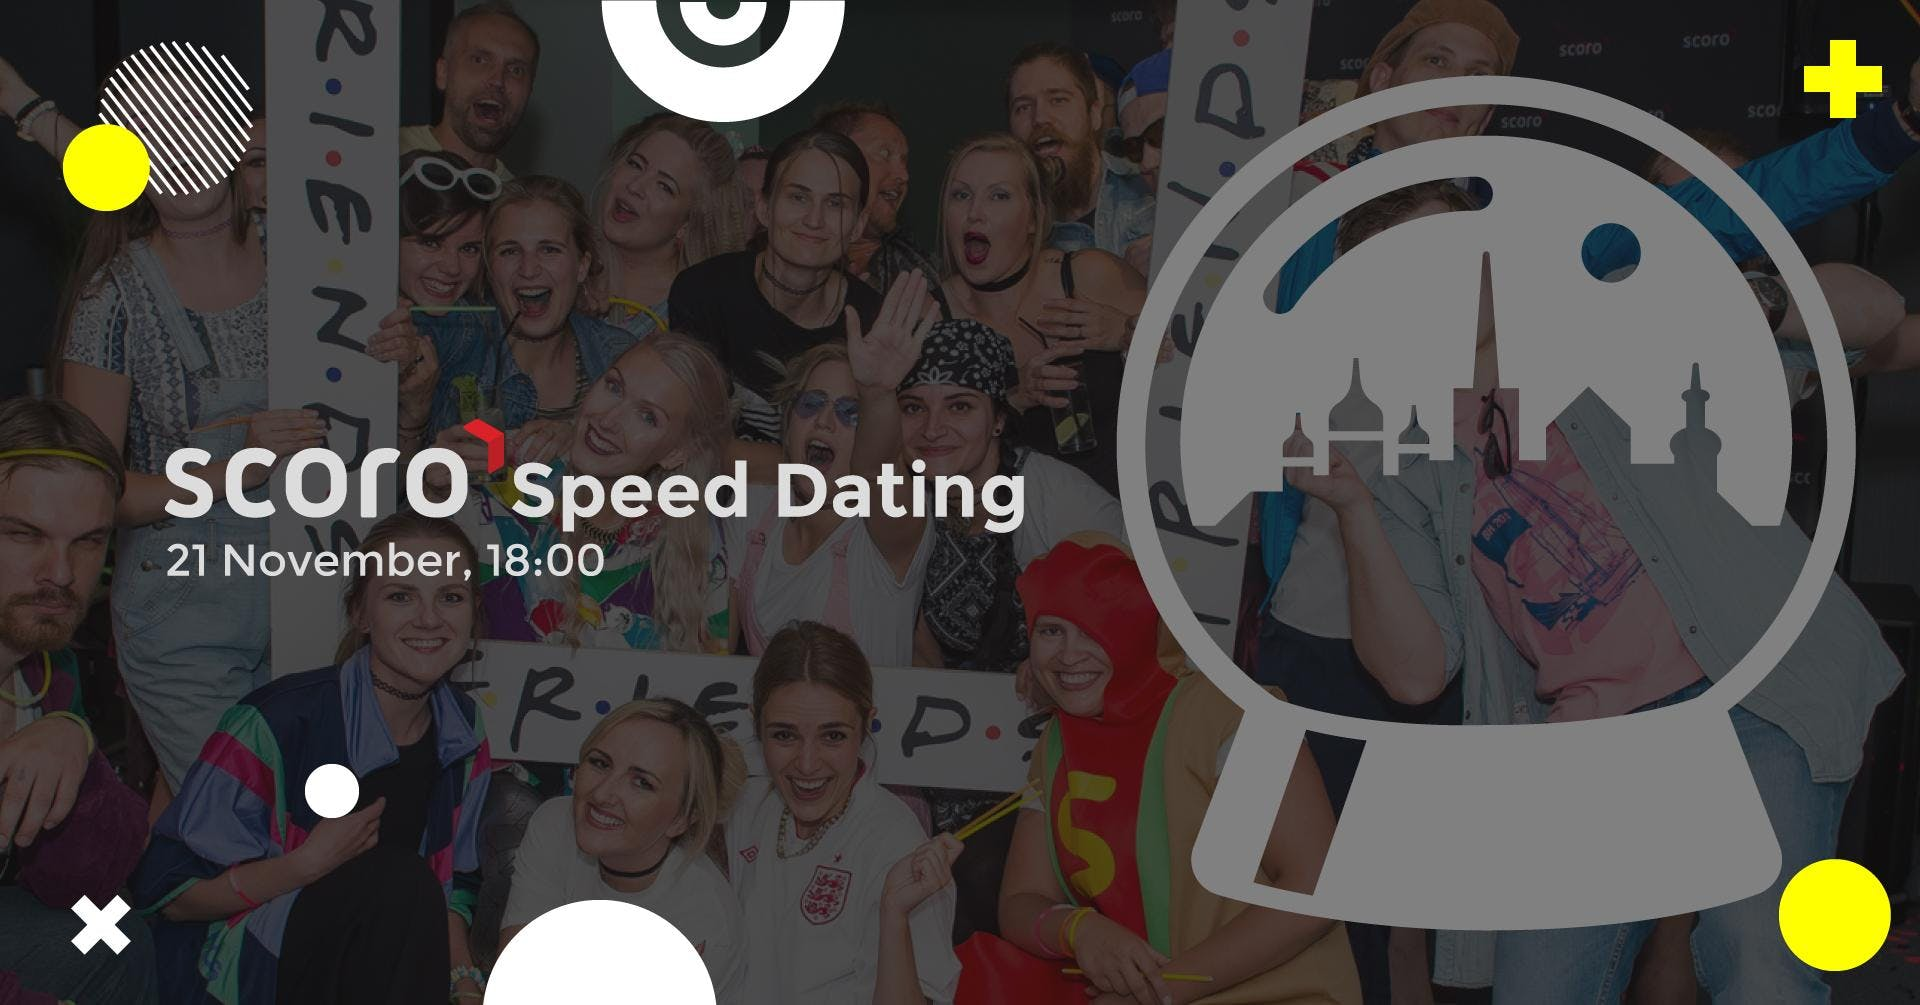 speed dating startup